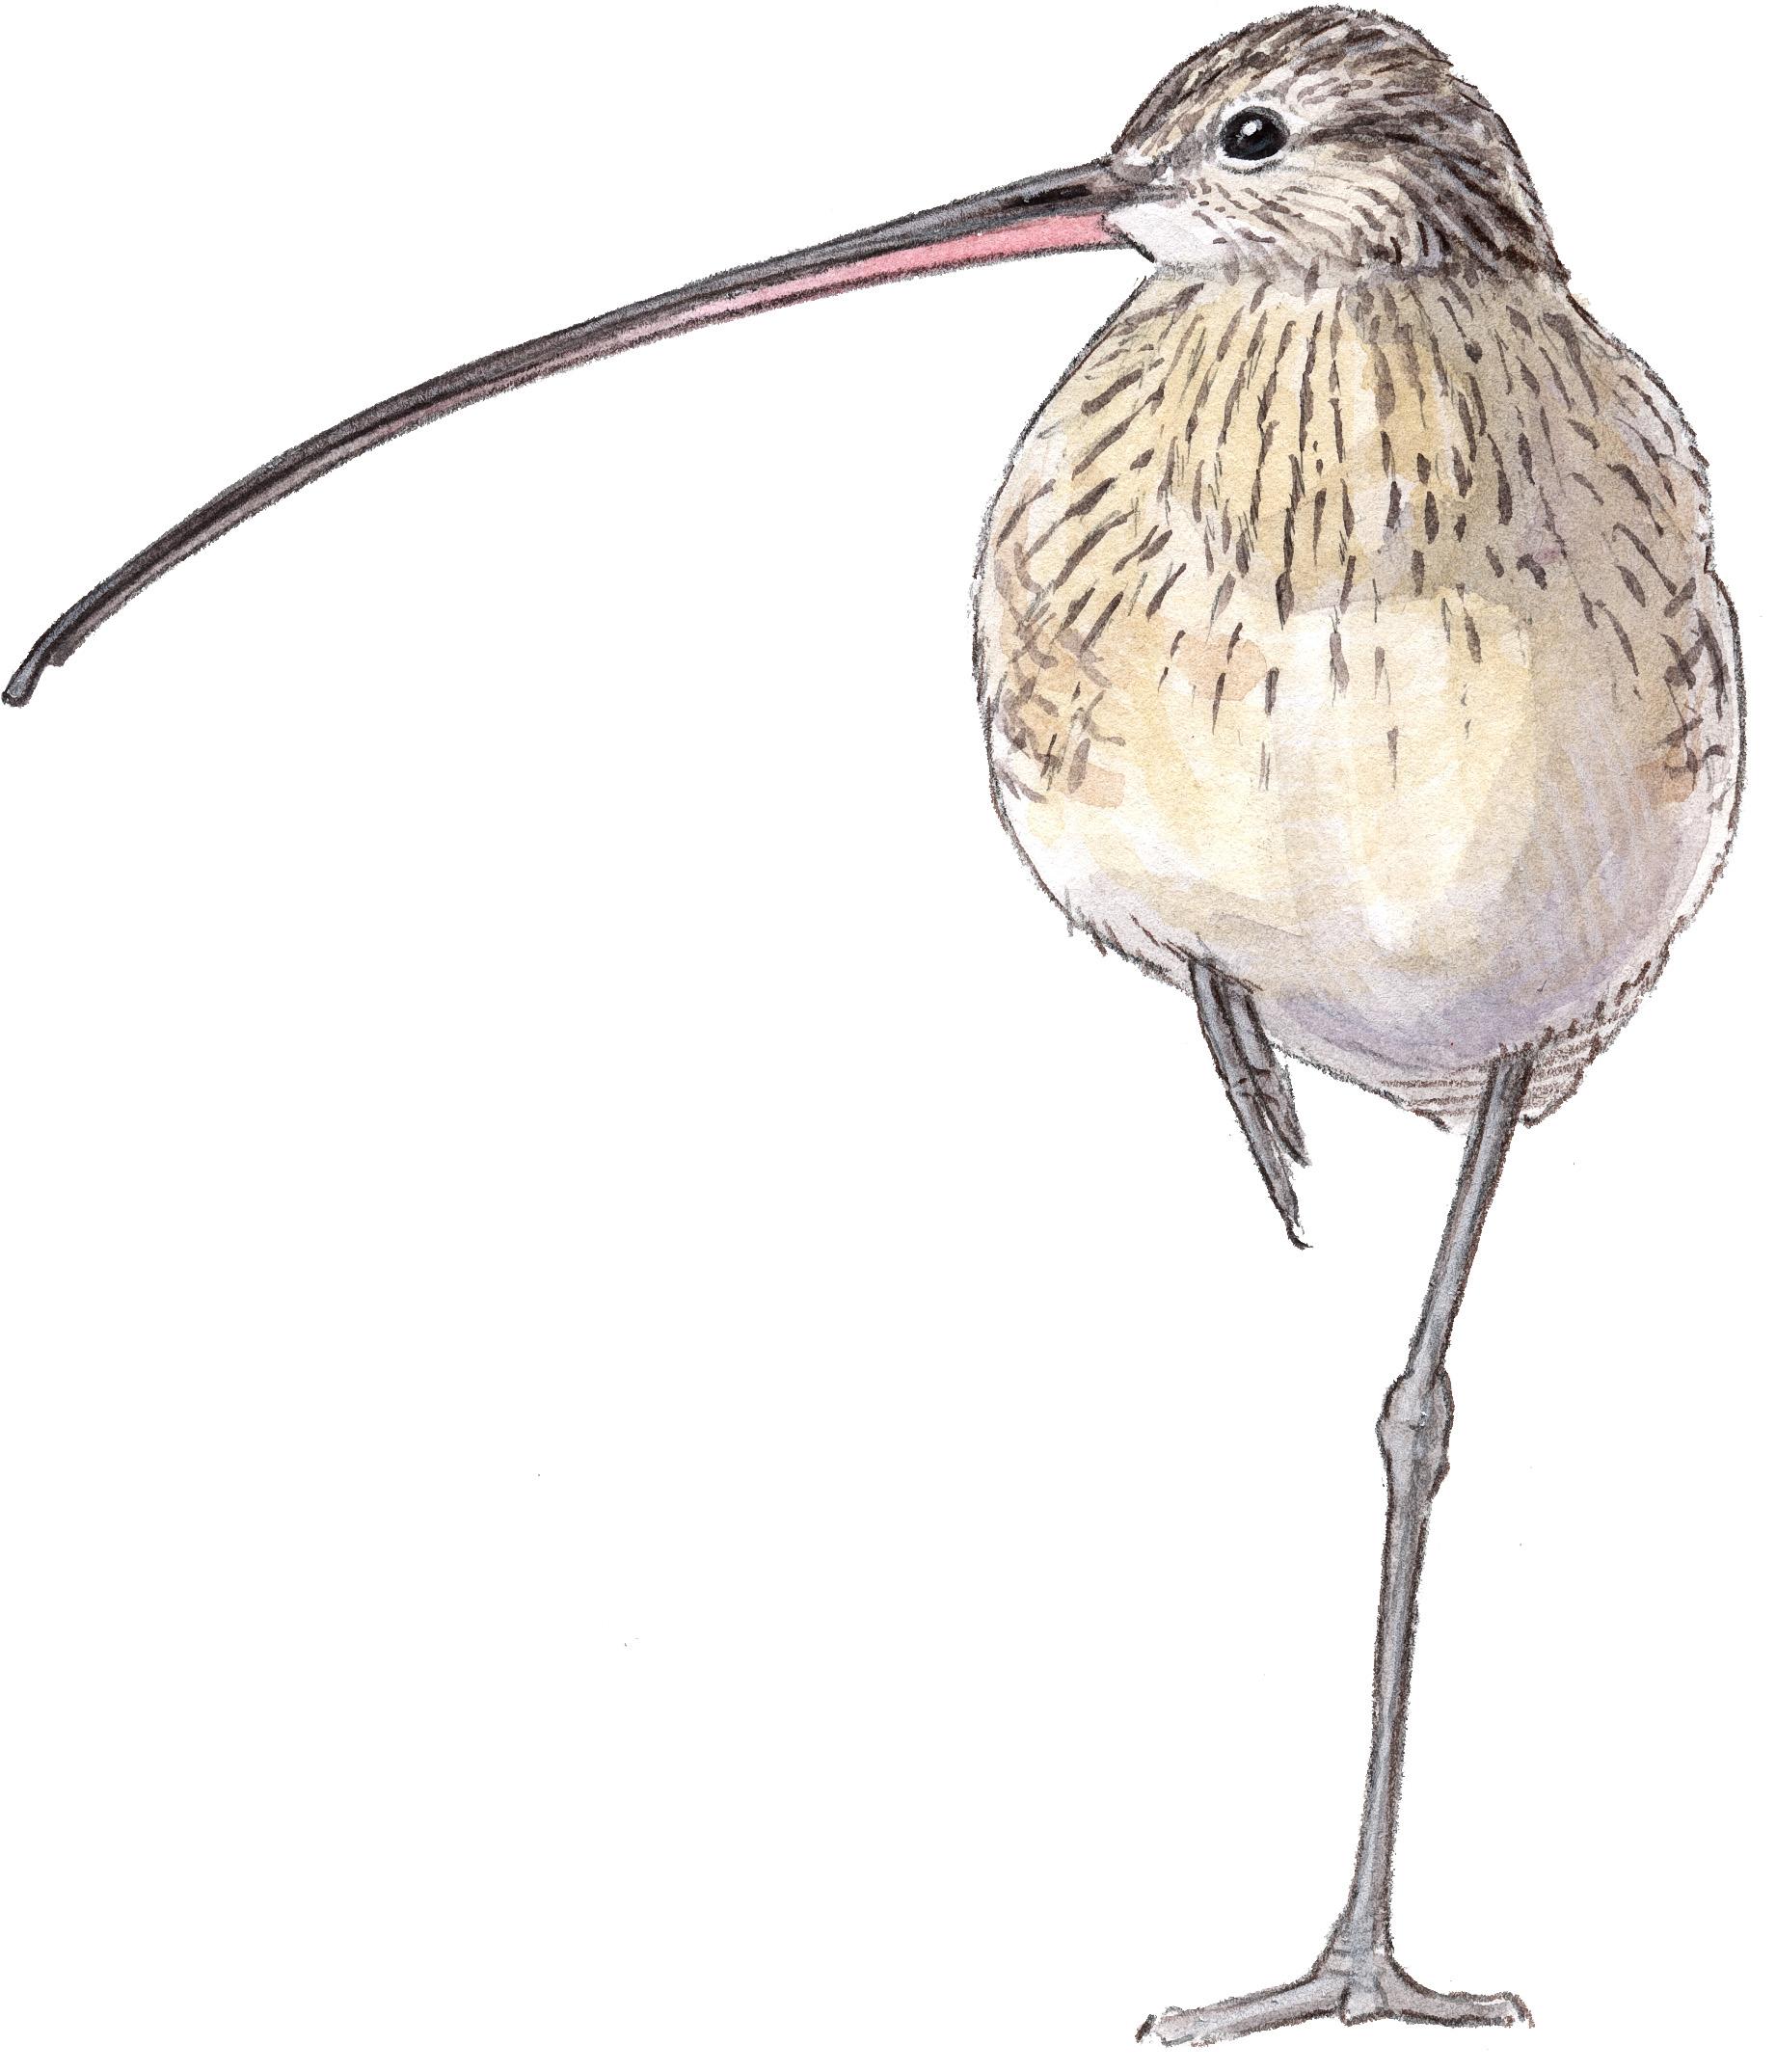 drawing waterfowl and waders john muir laws